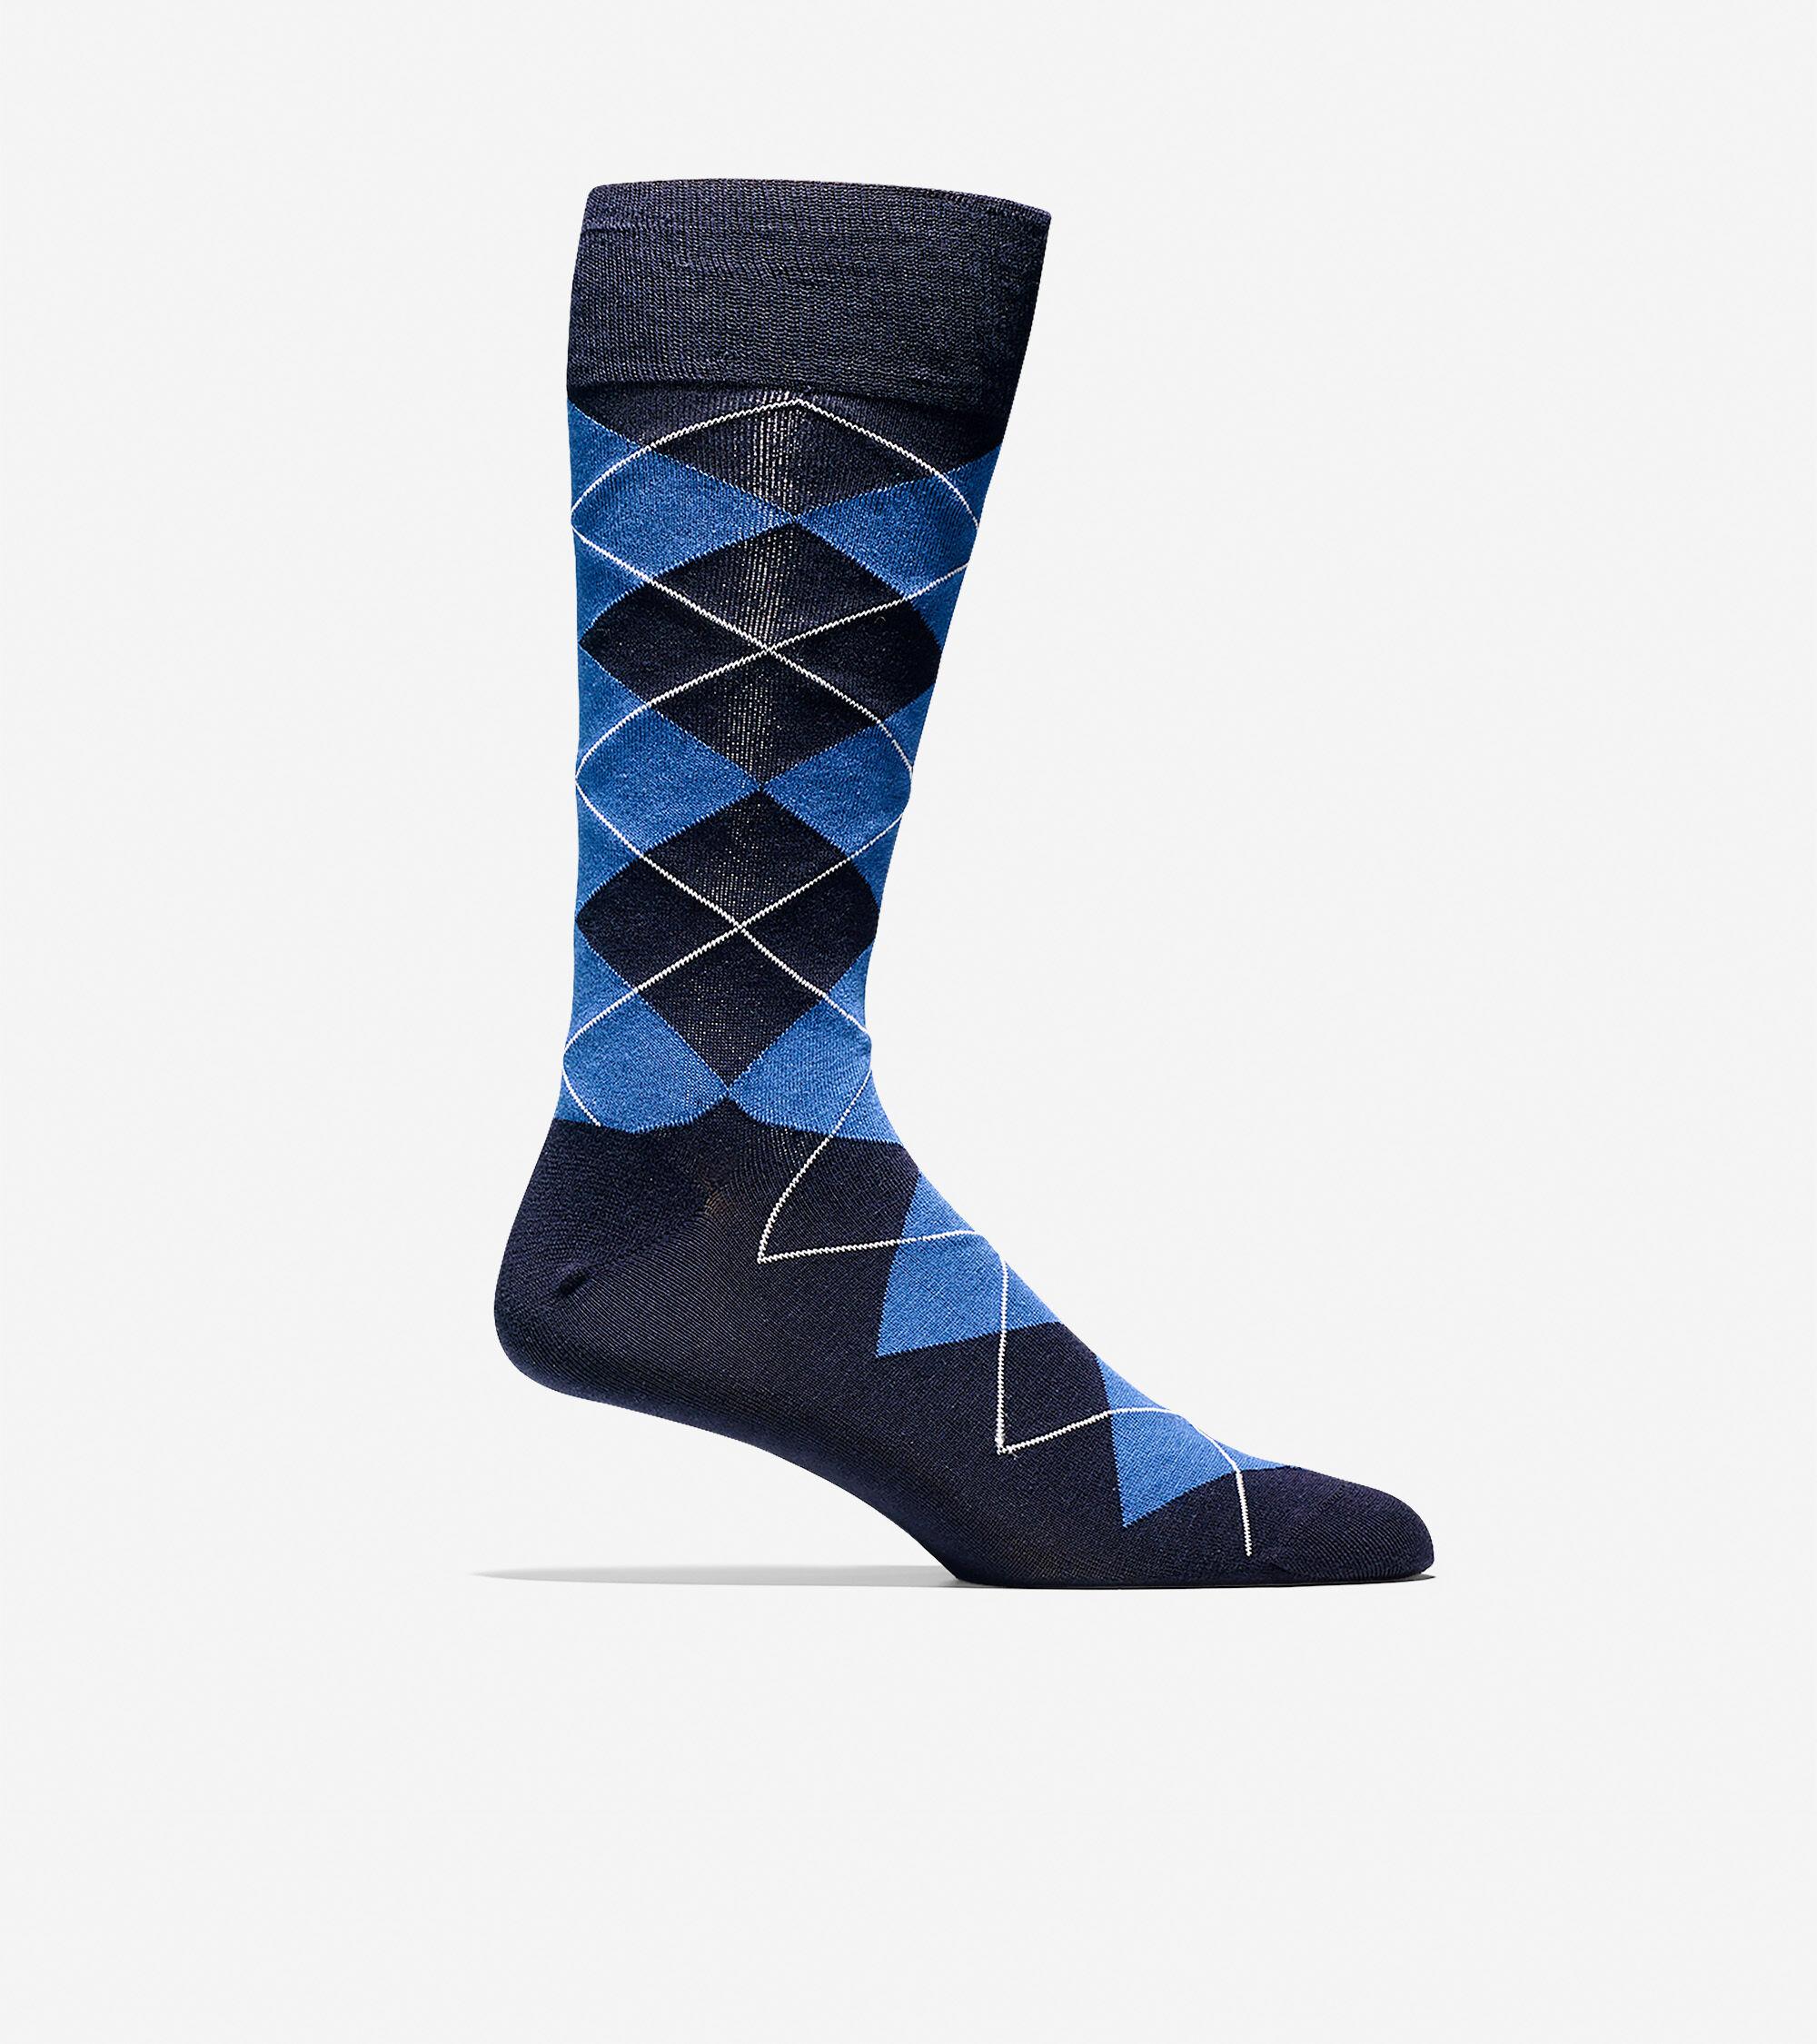 Cole Haan Mens Classic Argyle Socks